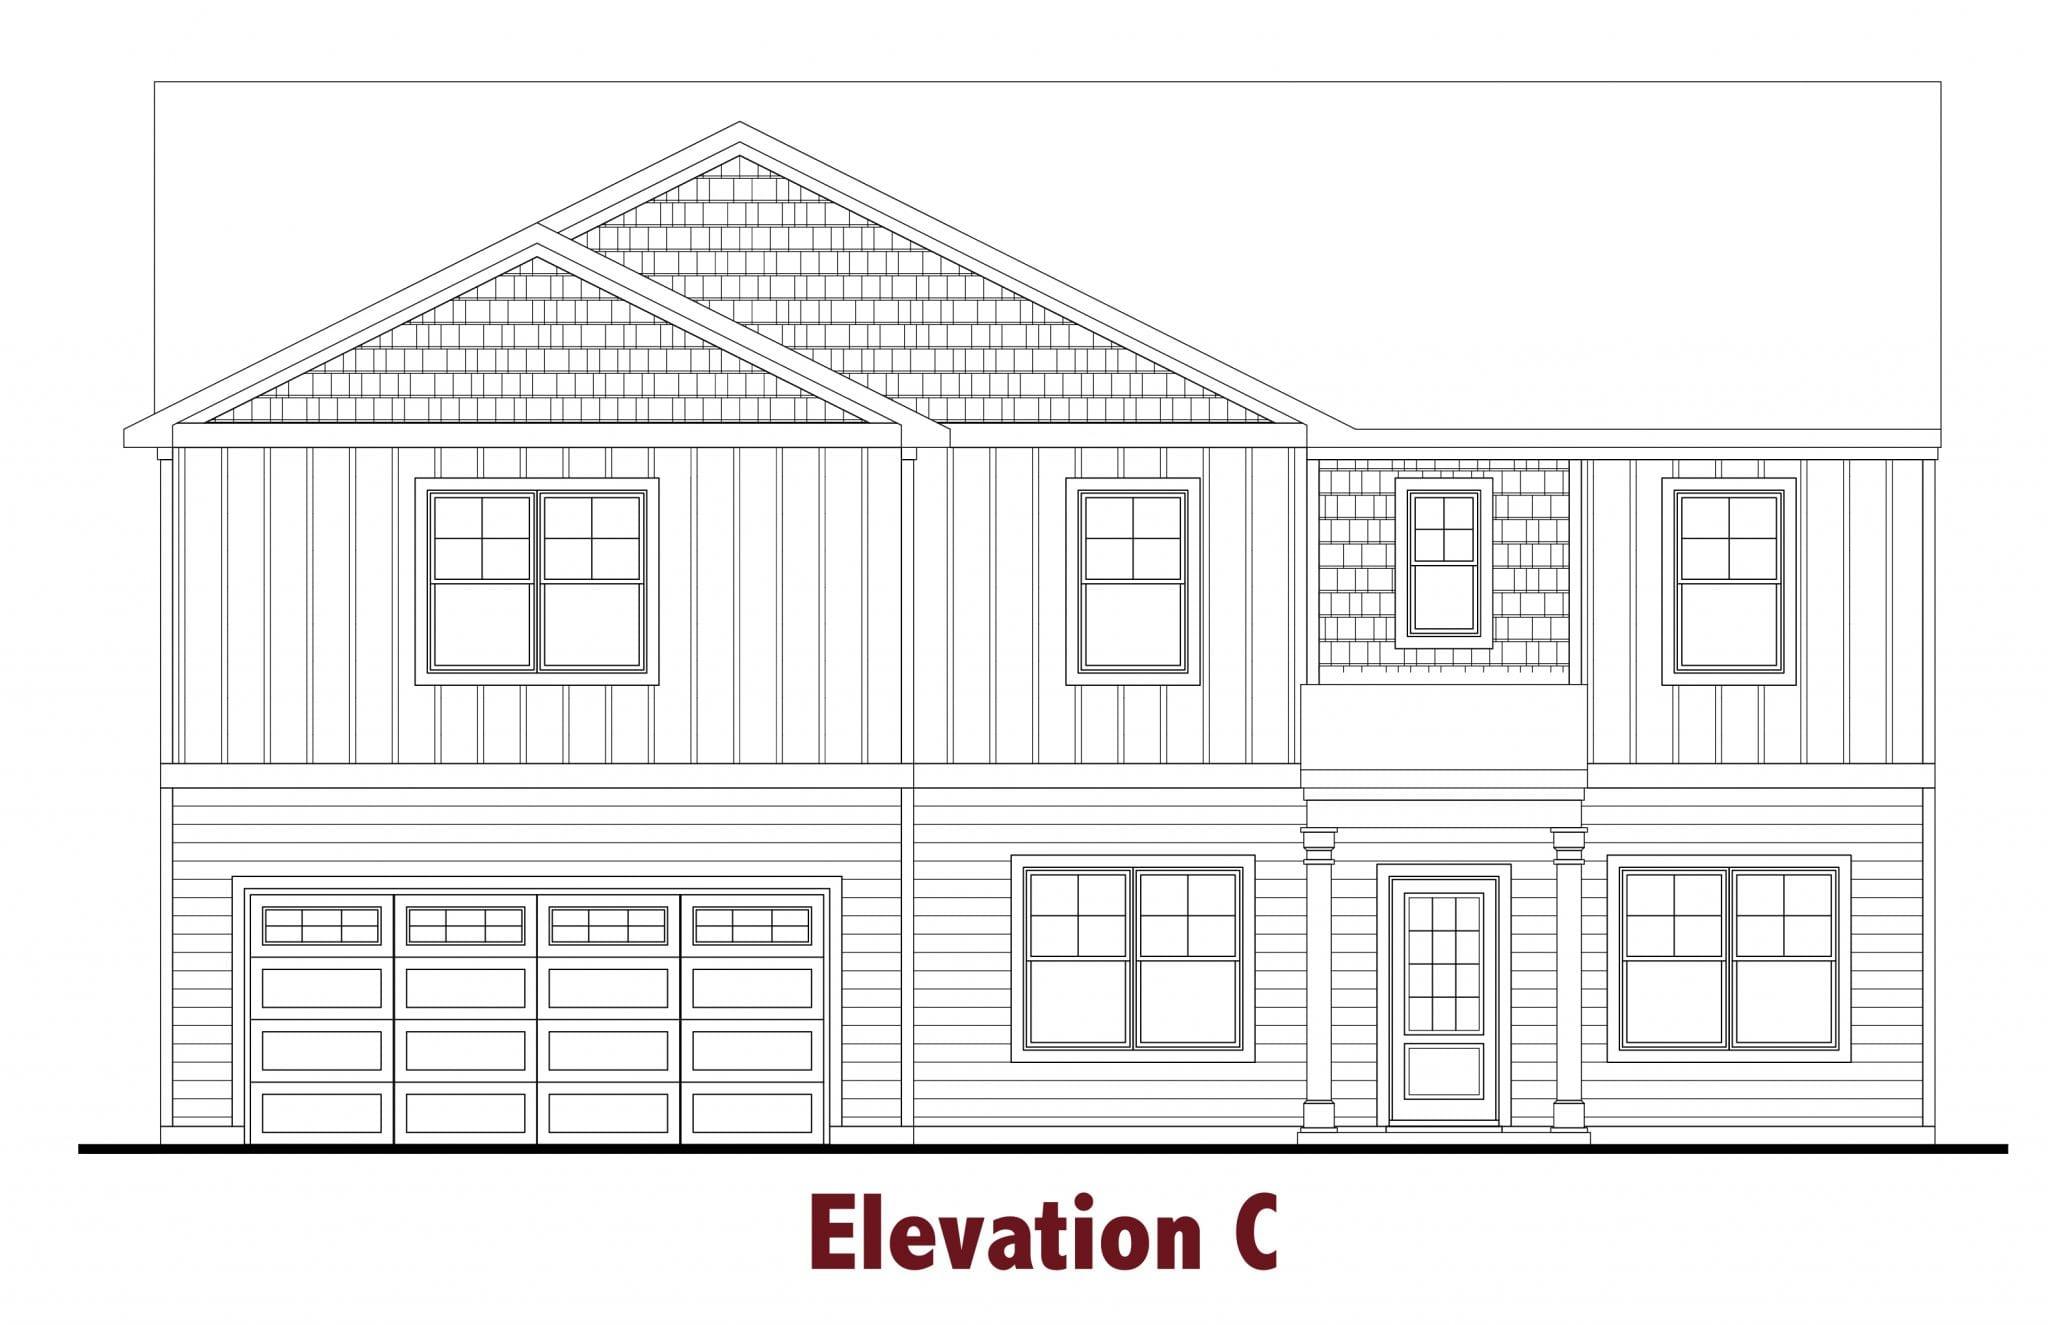 Richmond elevations Image